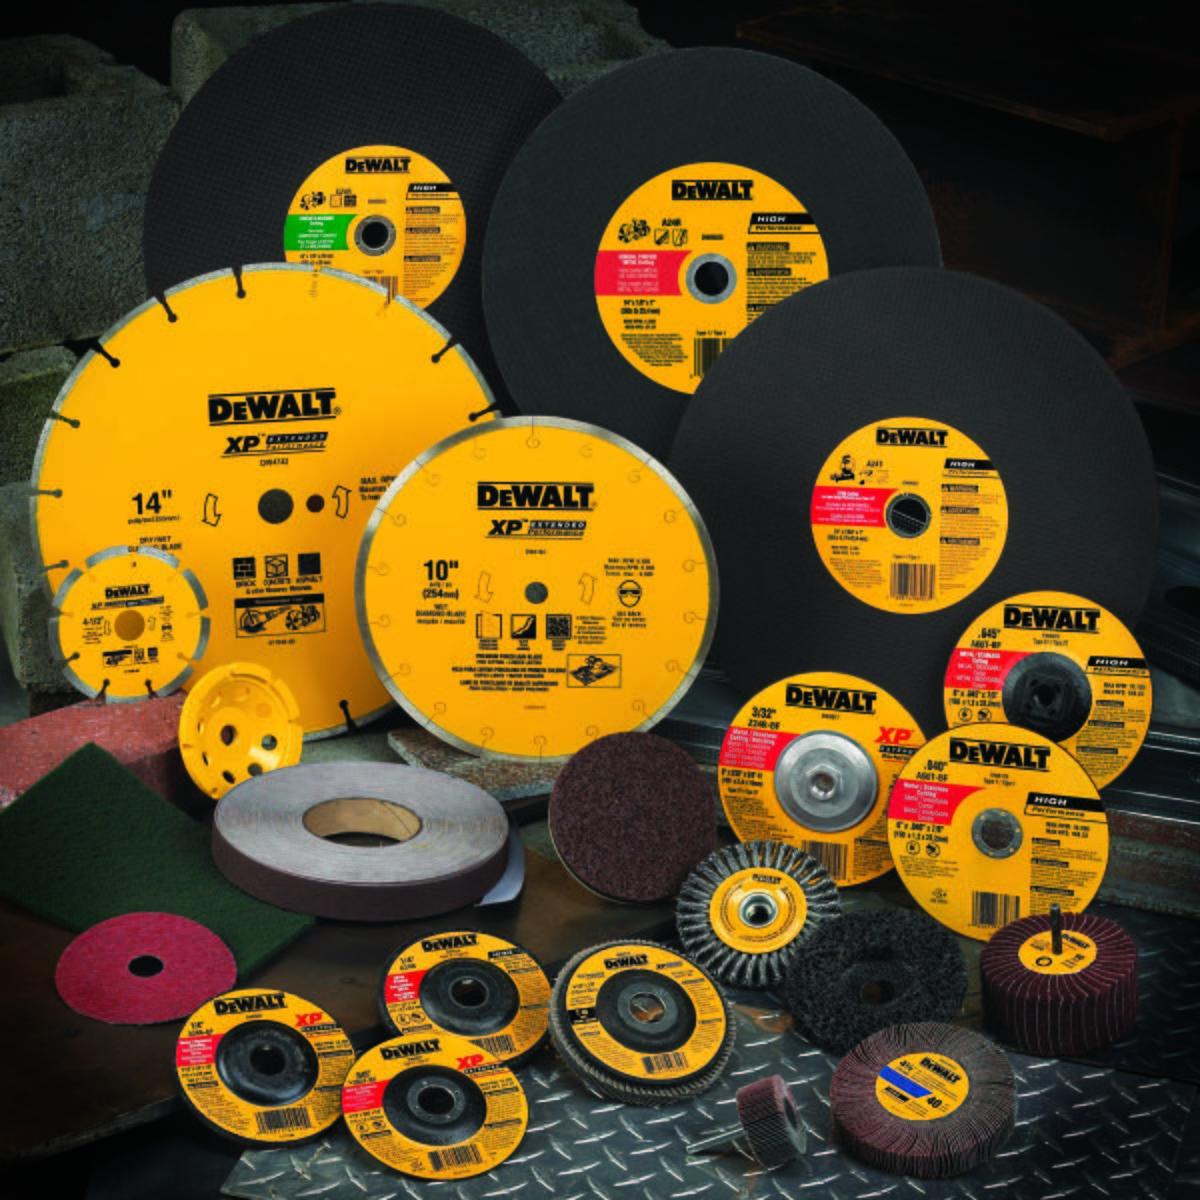 DeWalt General Purpose Grinding Wheel: 4 1/2 in Wheel Dia, 7/8 in Center Hole Dia, 1/4 in Wheel Thickness, Type 27 Type - 4-1/2X1/4 METAL GP (BLK)